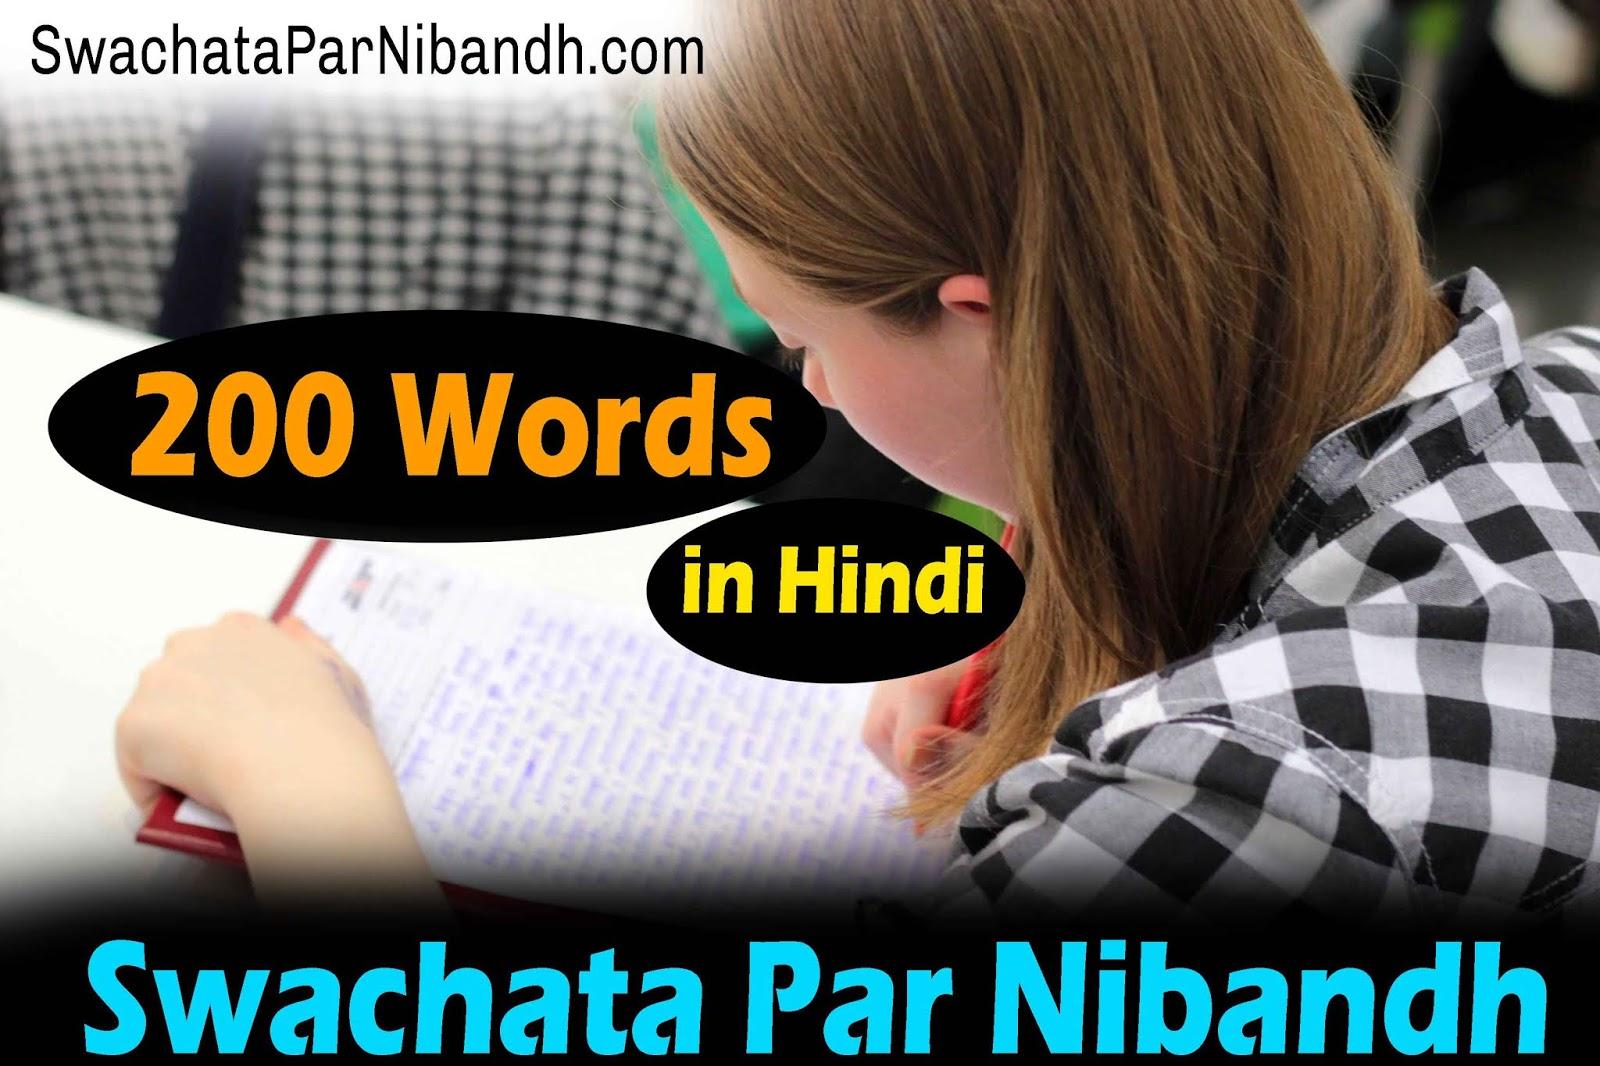 Gaon Ki Swachata Par 200 Shabd Ka Nibandh, Swachata Par Nibandh 200 Shabd ka, swachata par nibandh class 5, SwachataParNibandh, स्वच्छता पर निबंध 200 शब्द,